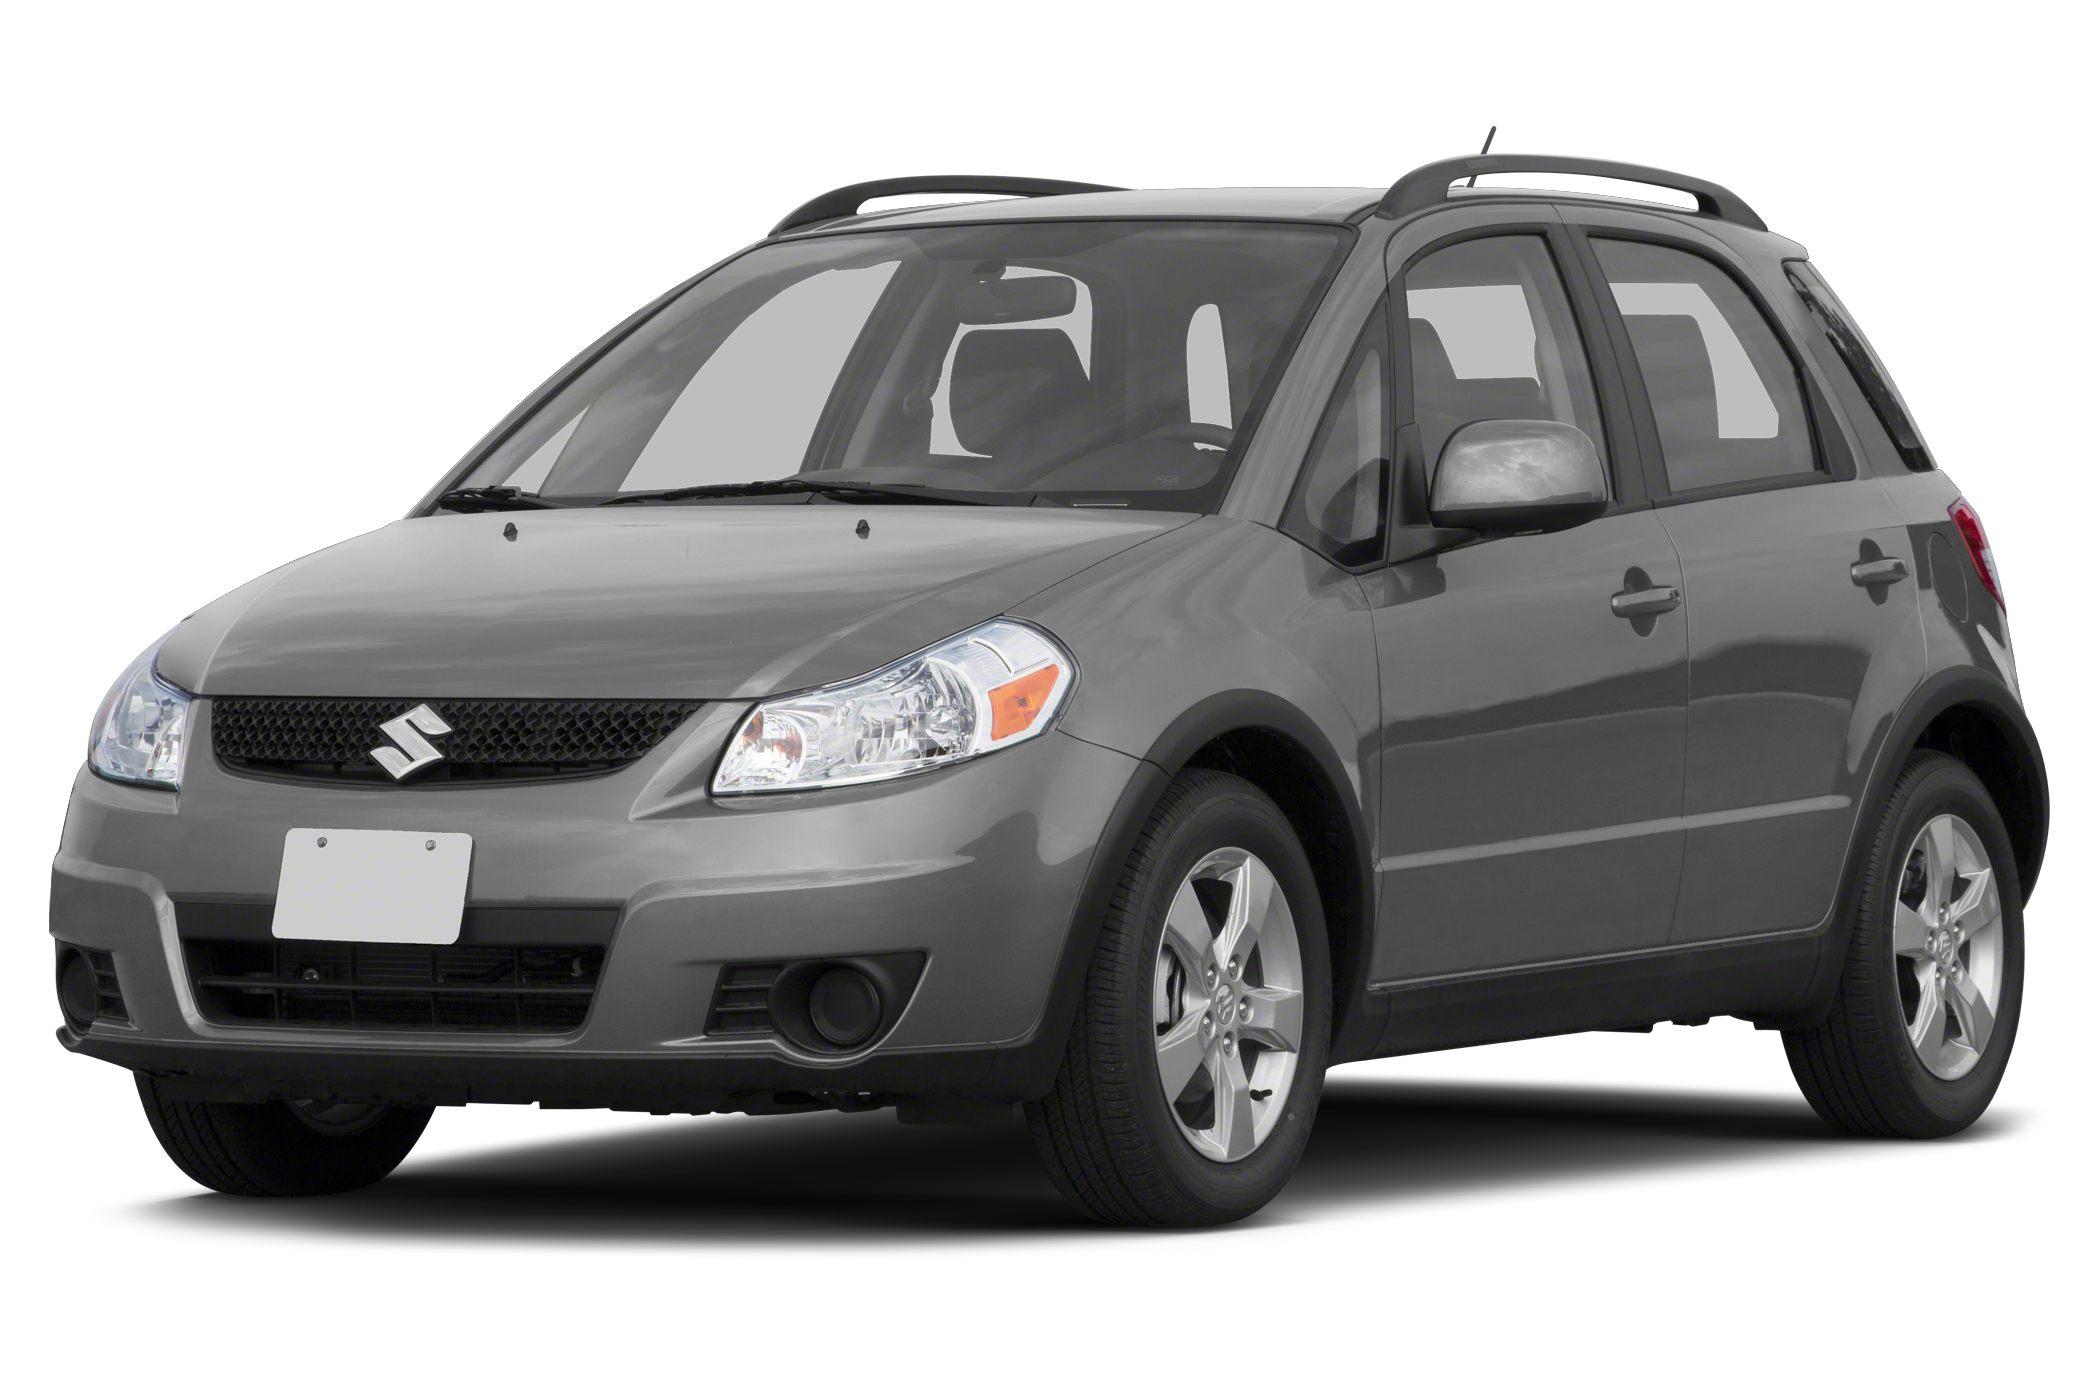 2012 Suzuki SX4 Premium Hatchback for sale in Little Rock for $0 with 26,052 miles